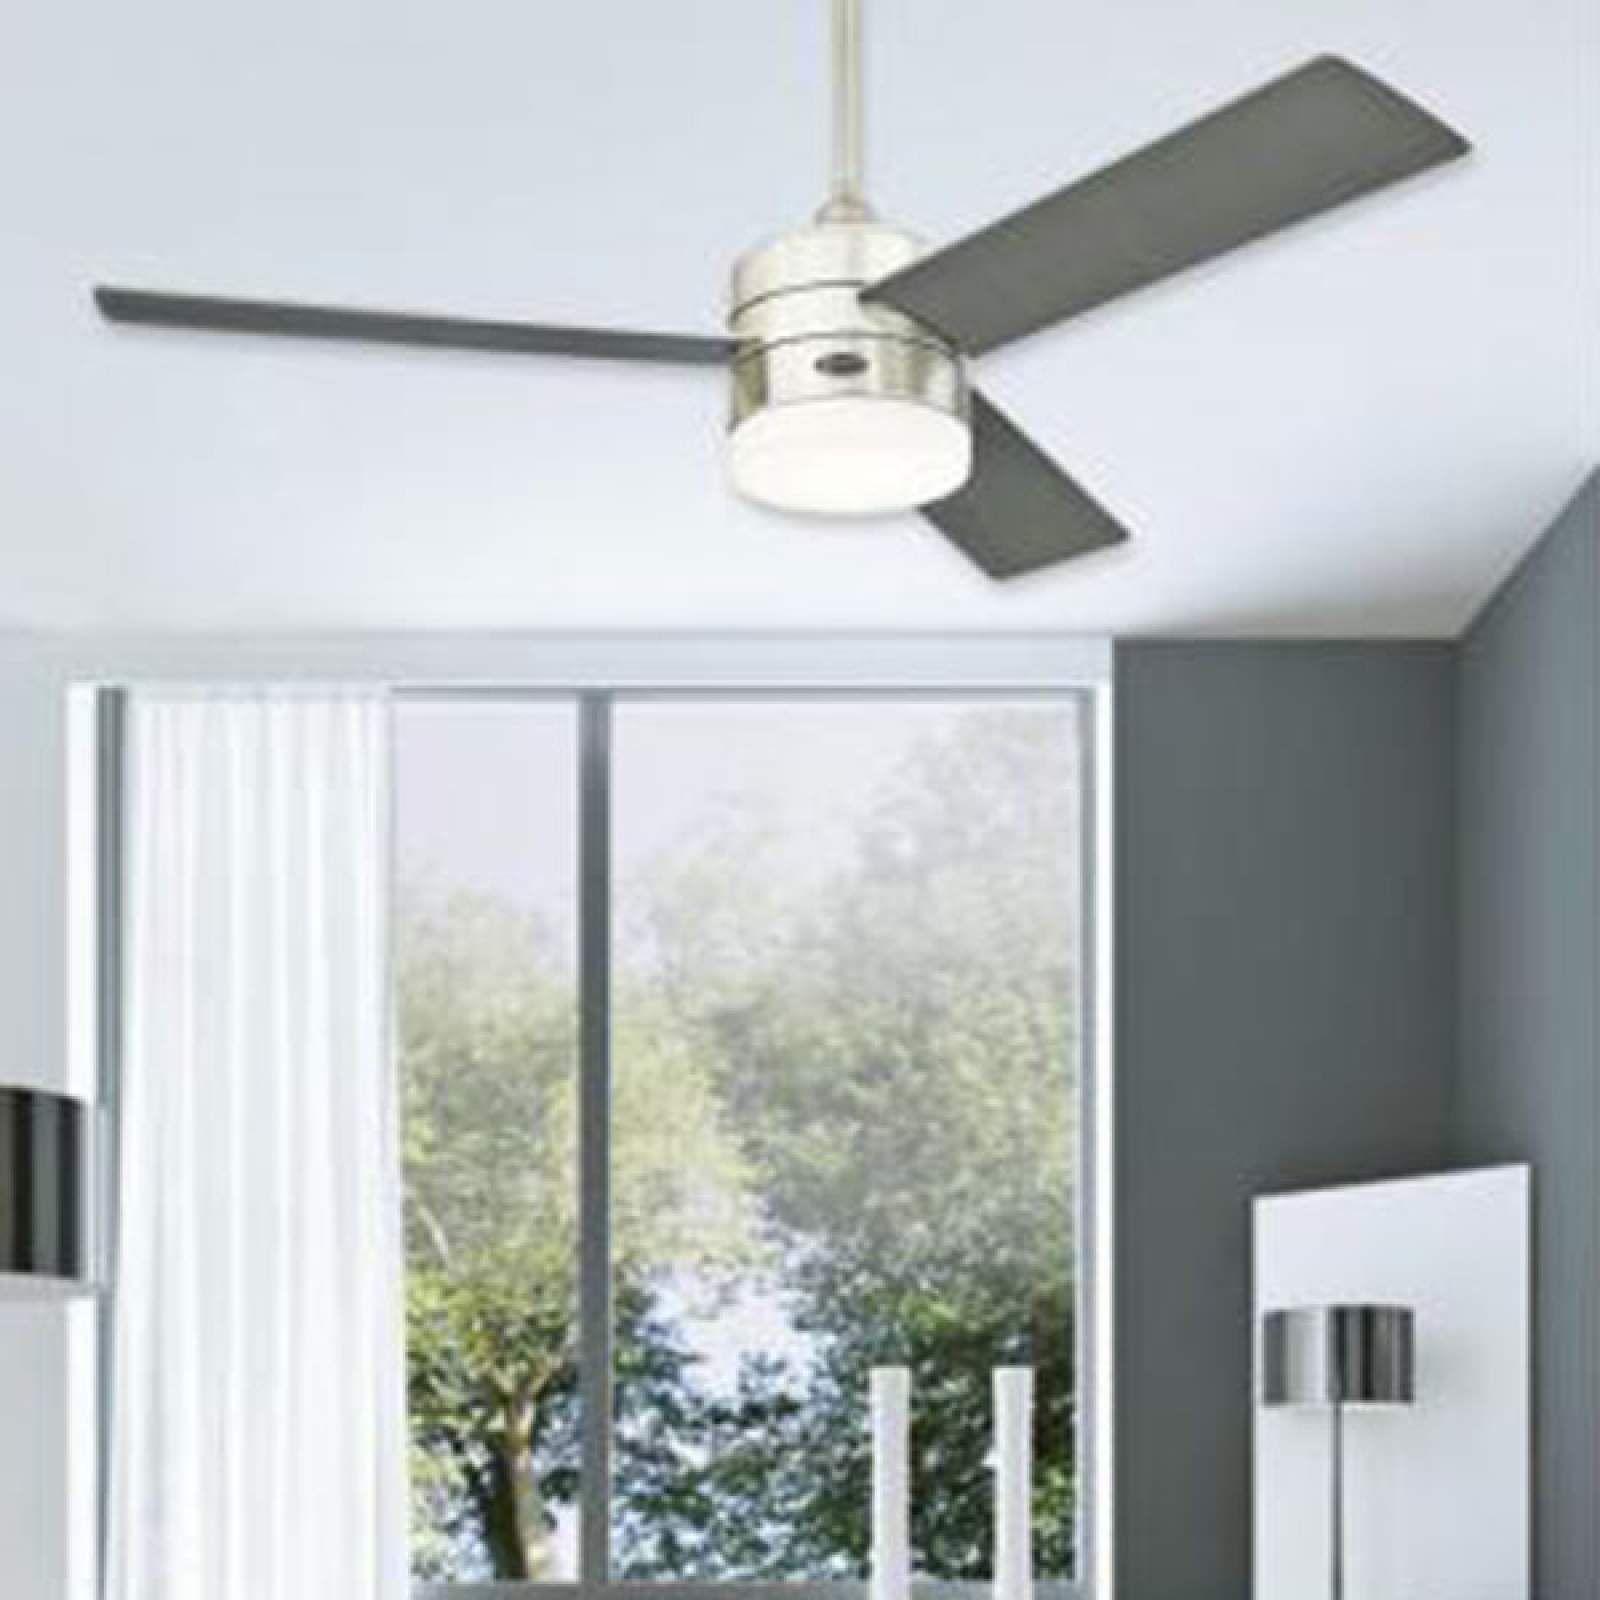 Westinghouse Alta Vista Moderner Ventilator Deckenventilator Ventilator Und Beleuchtung